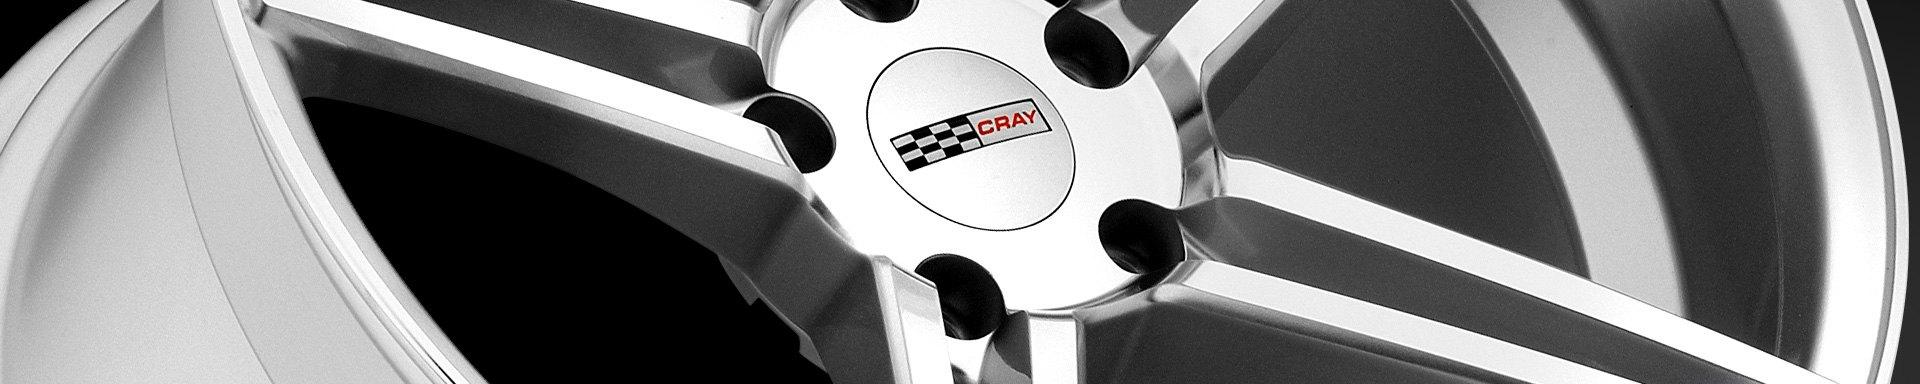 Universal Cray WHEELS & RIMS